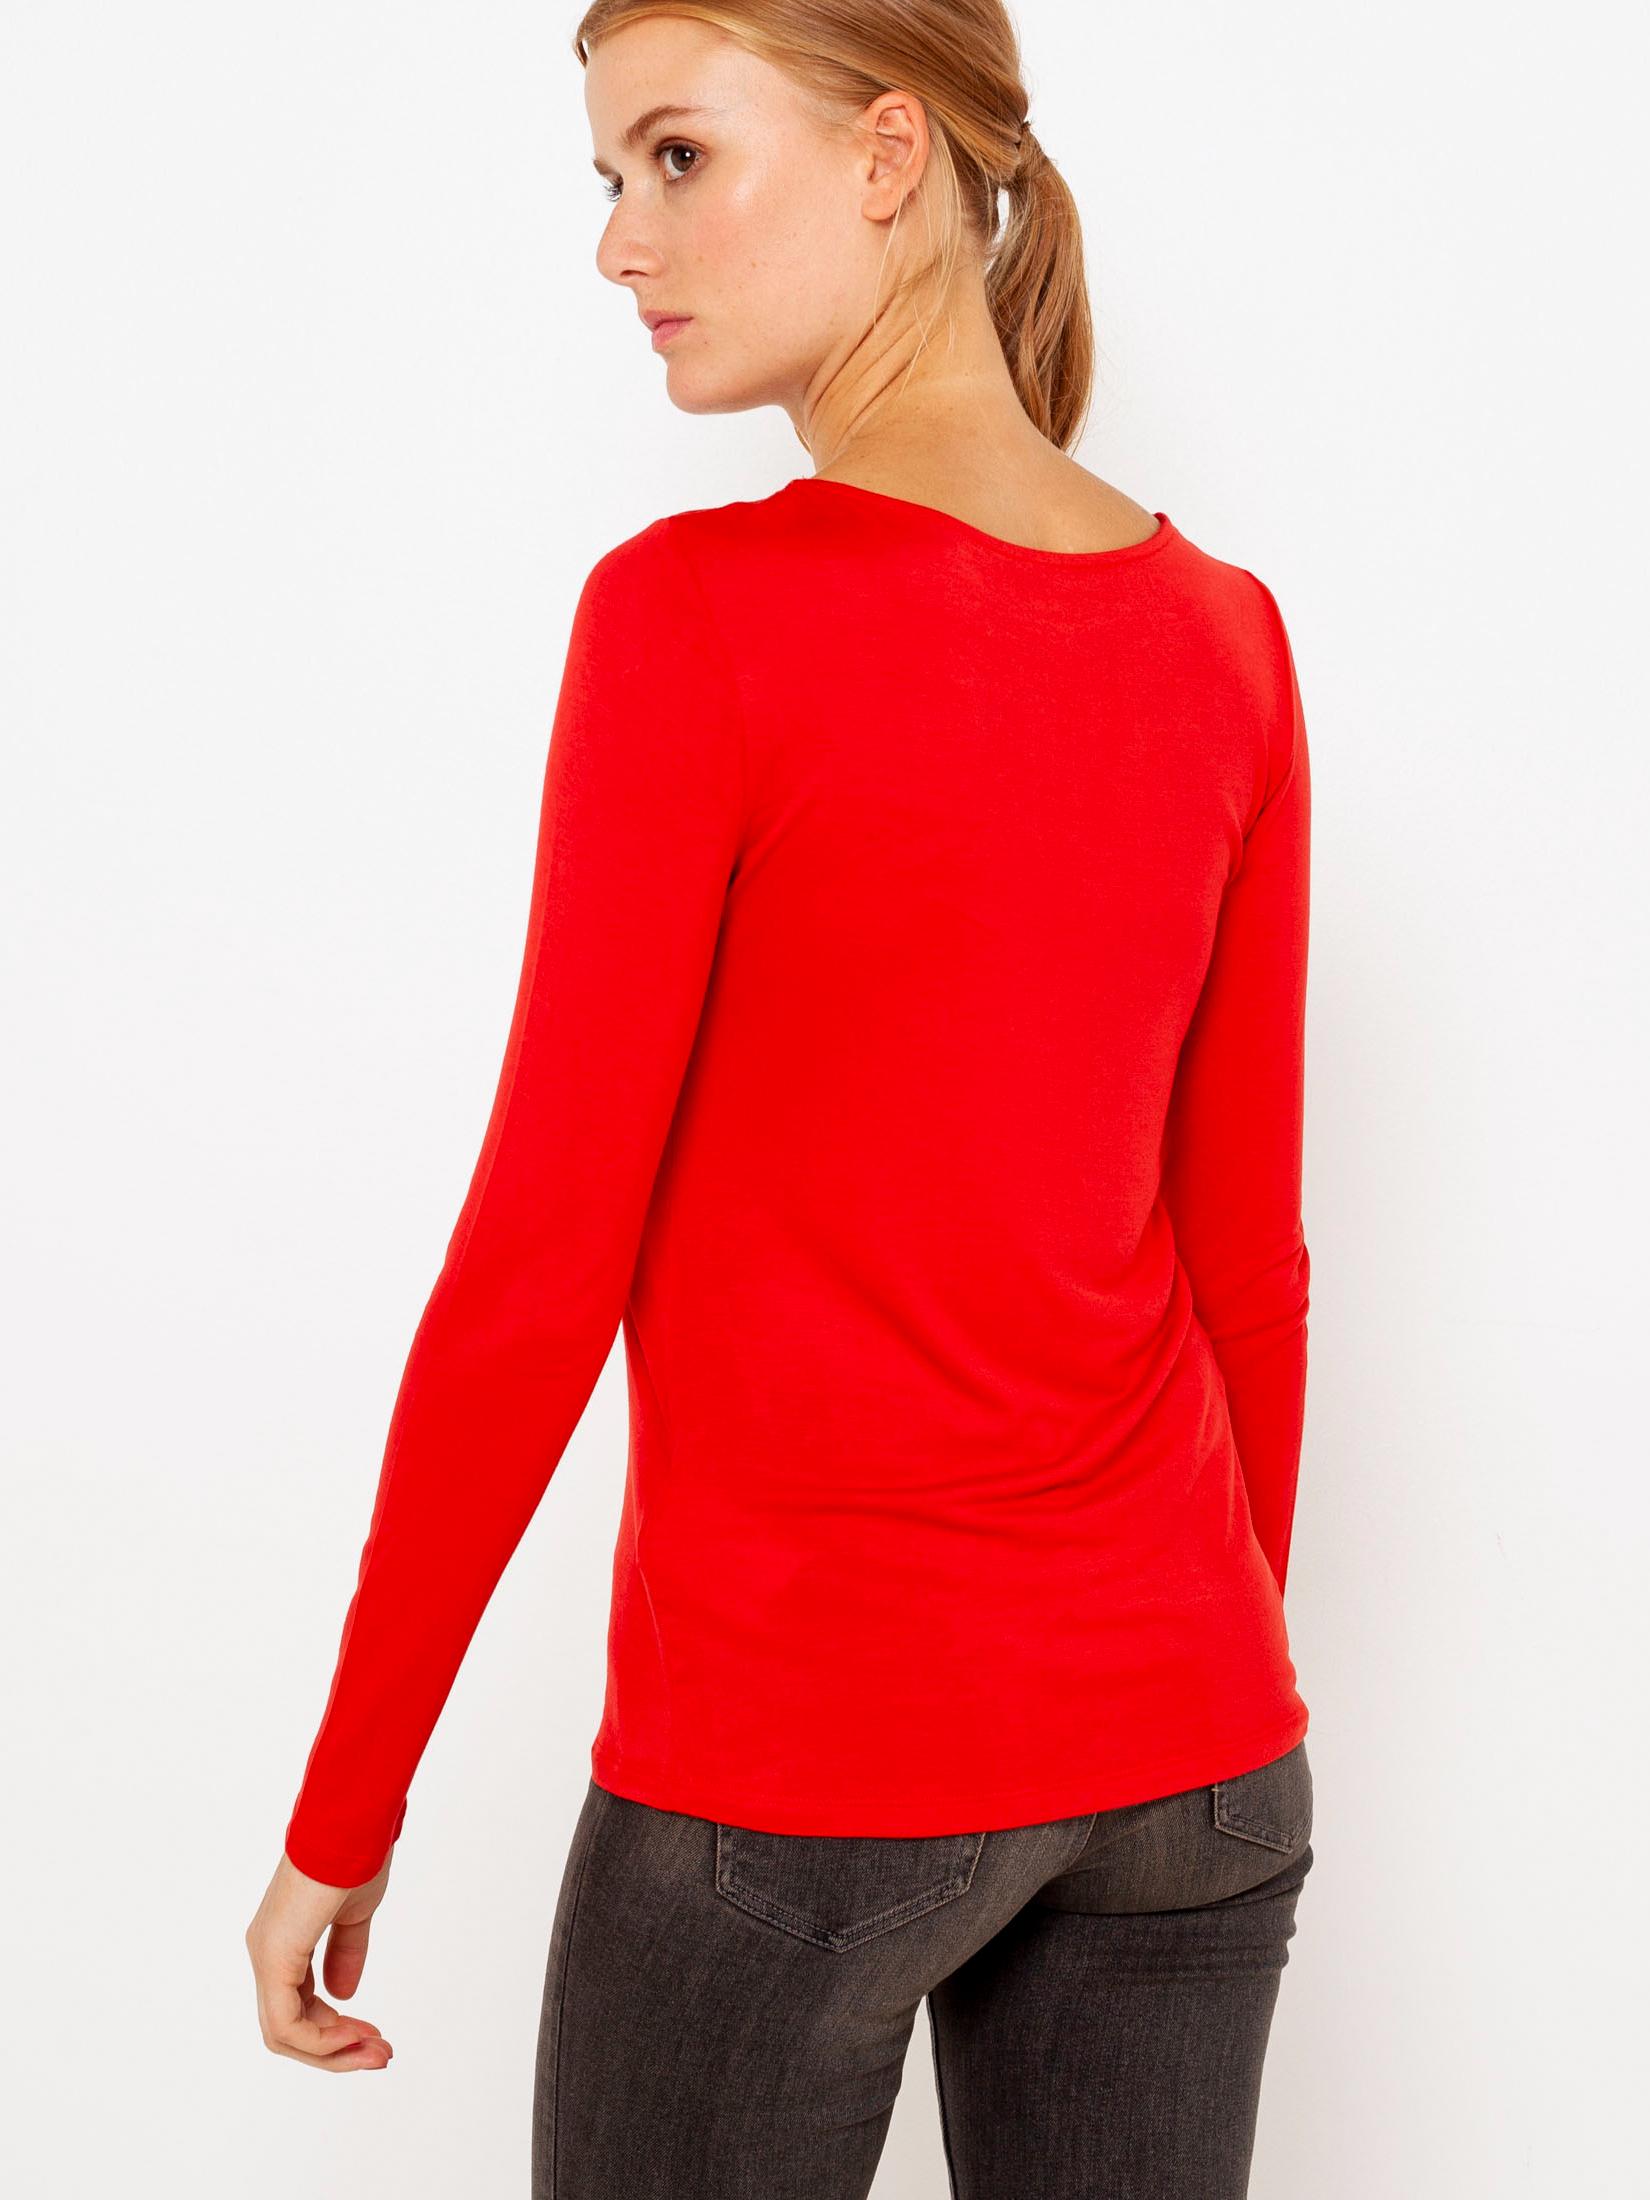 CAMAIEU czerwony damska koszulka z koronką